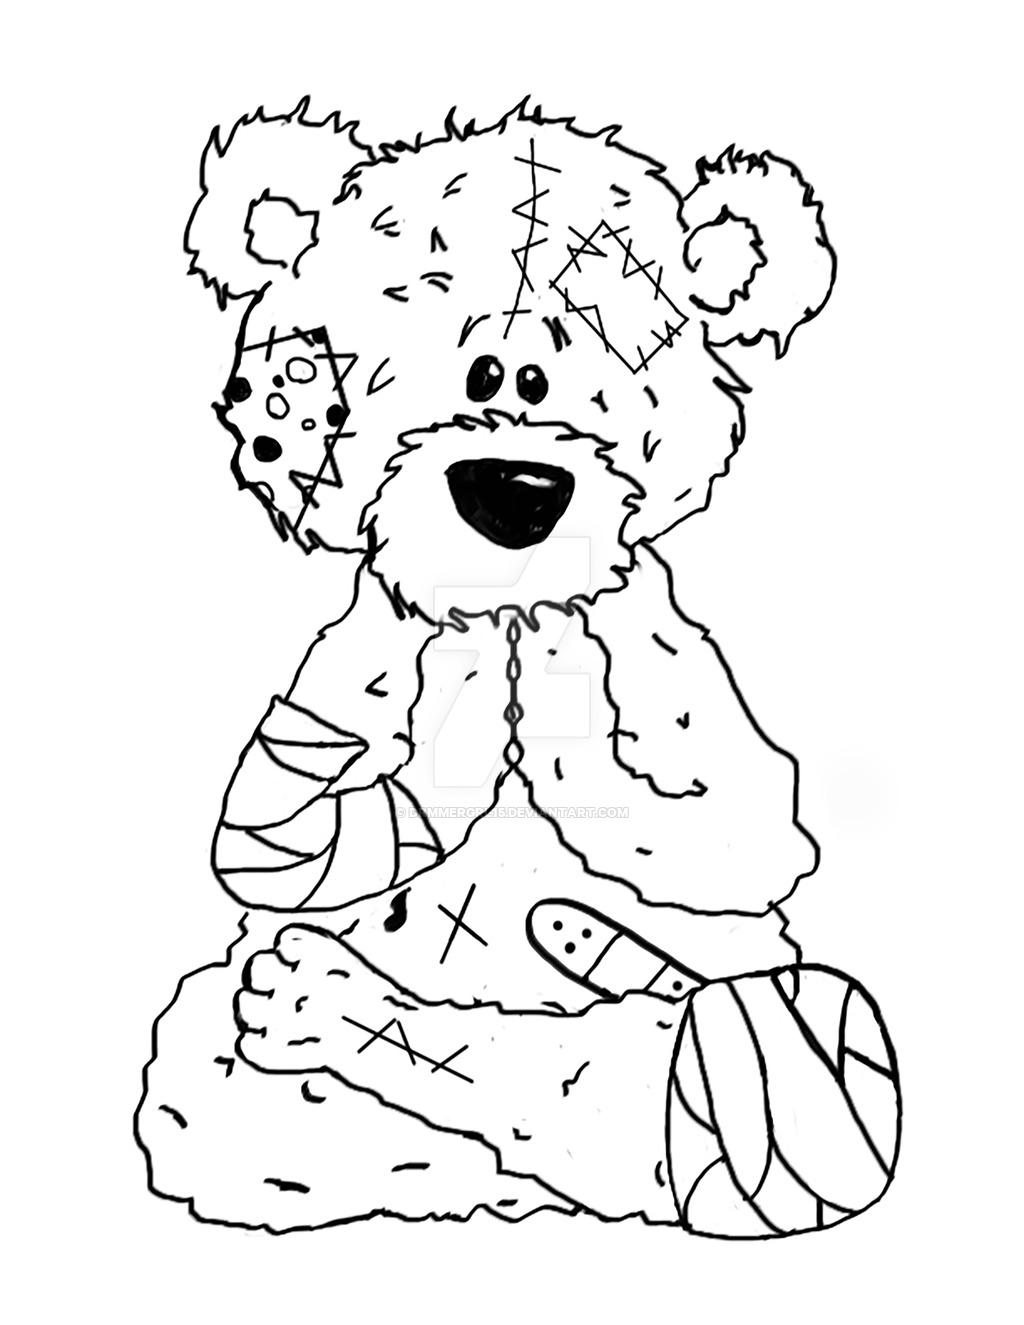 Digital art buddha teddy bear outline by drmmergrl on deviantart clip art